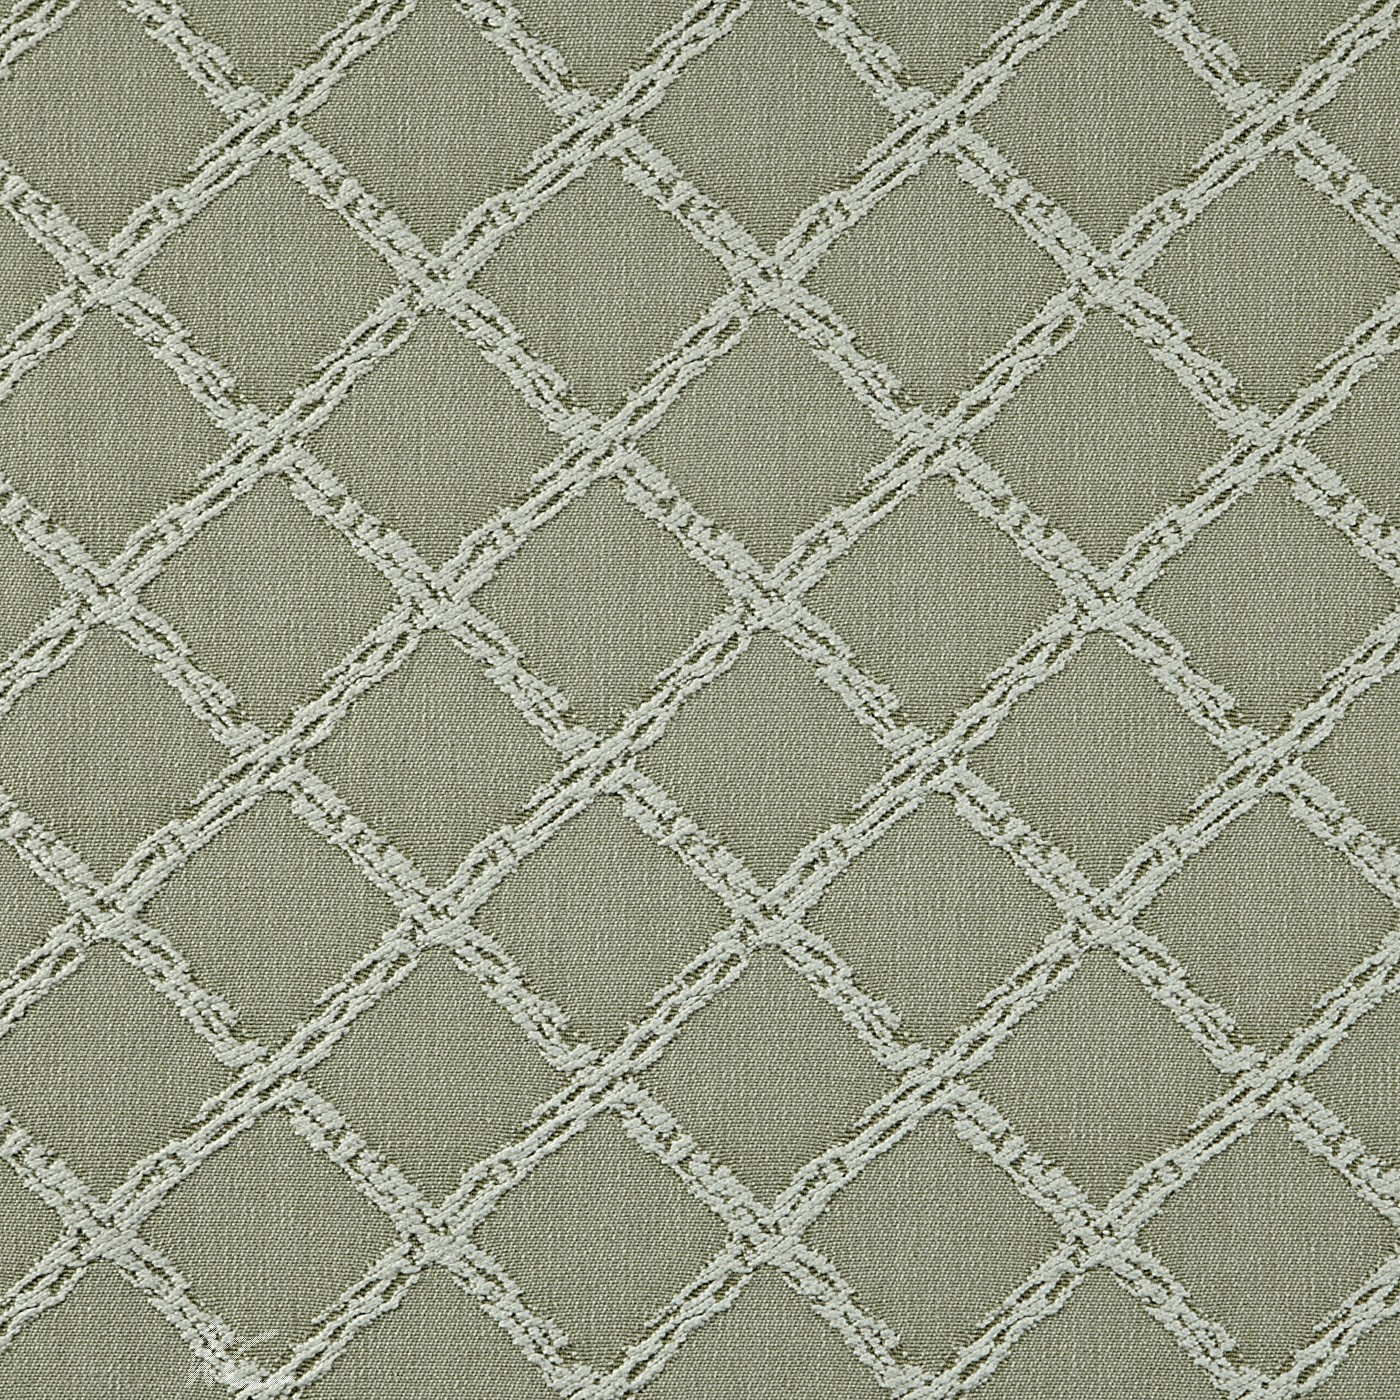 Prestigious Textiles Dorchester Charlbury Linen Curtain Fabric